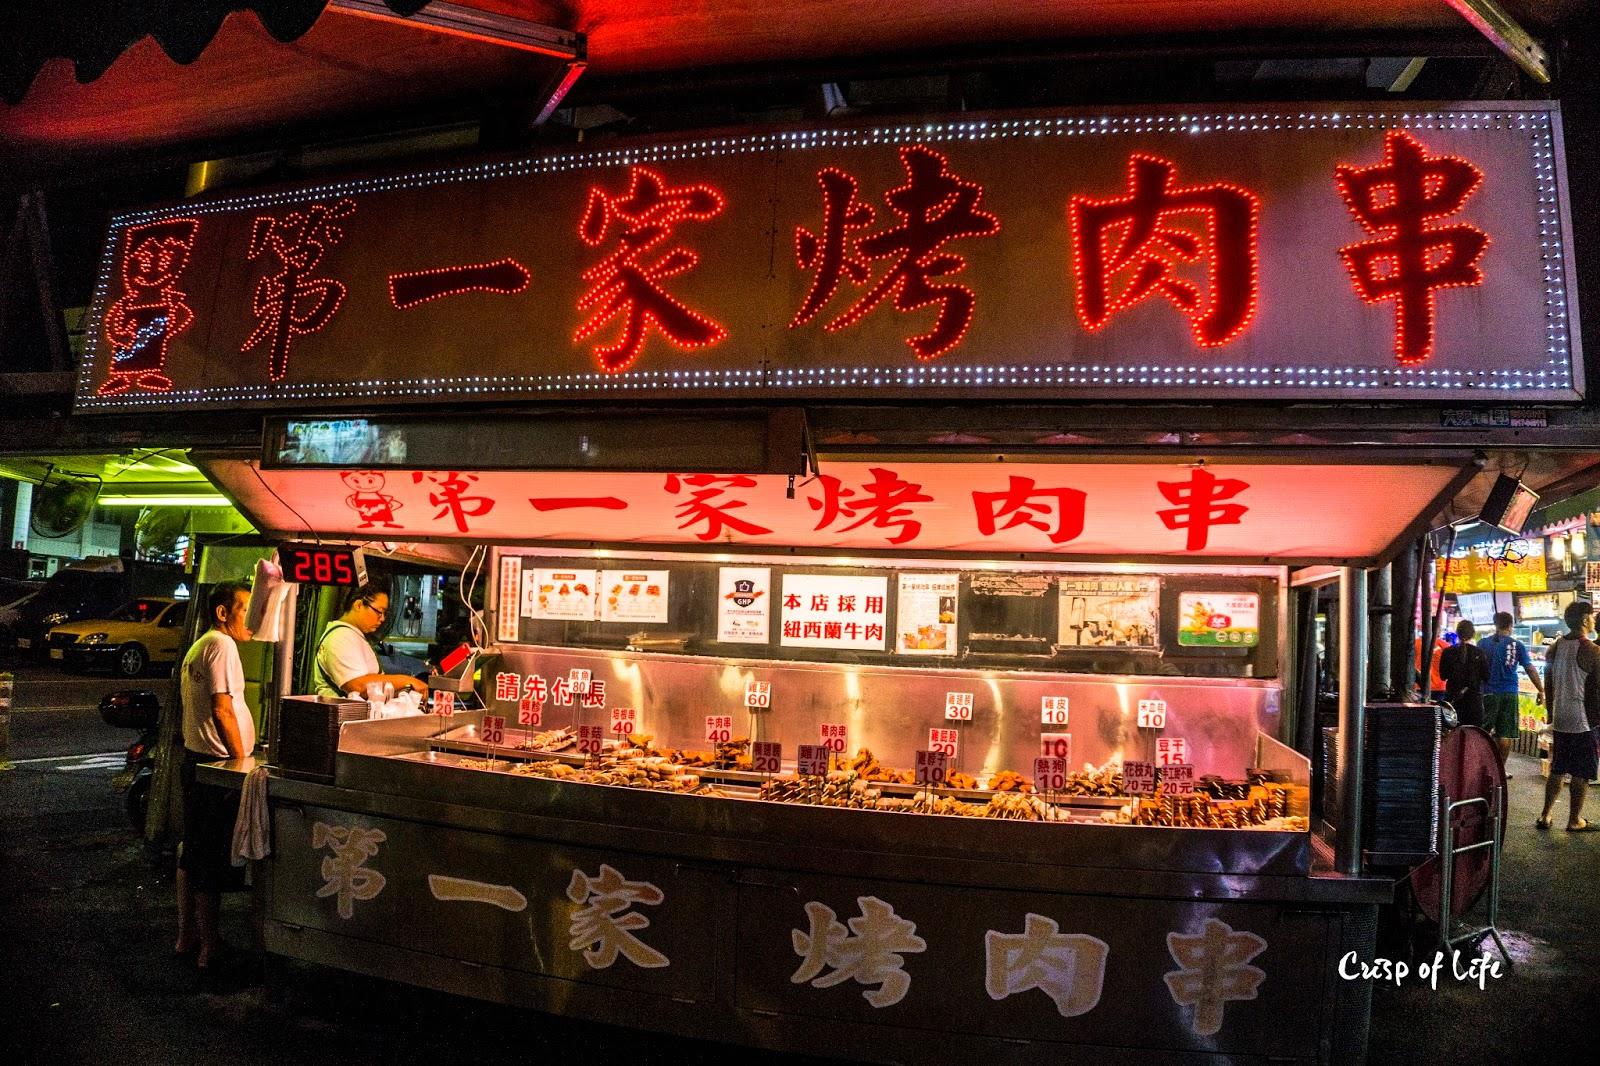 [HUALIEN 花莲] Day 6: Zi Qiang Night Market 第六天:自强夜市